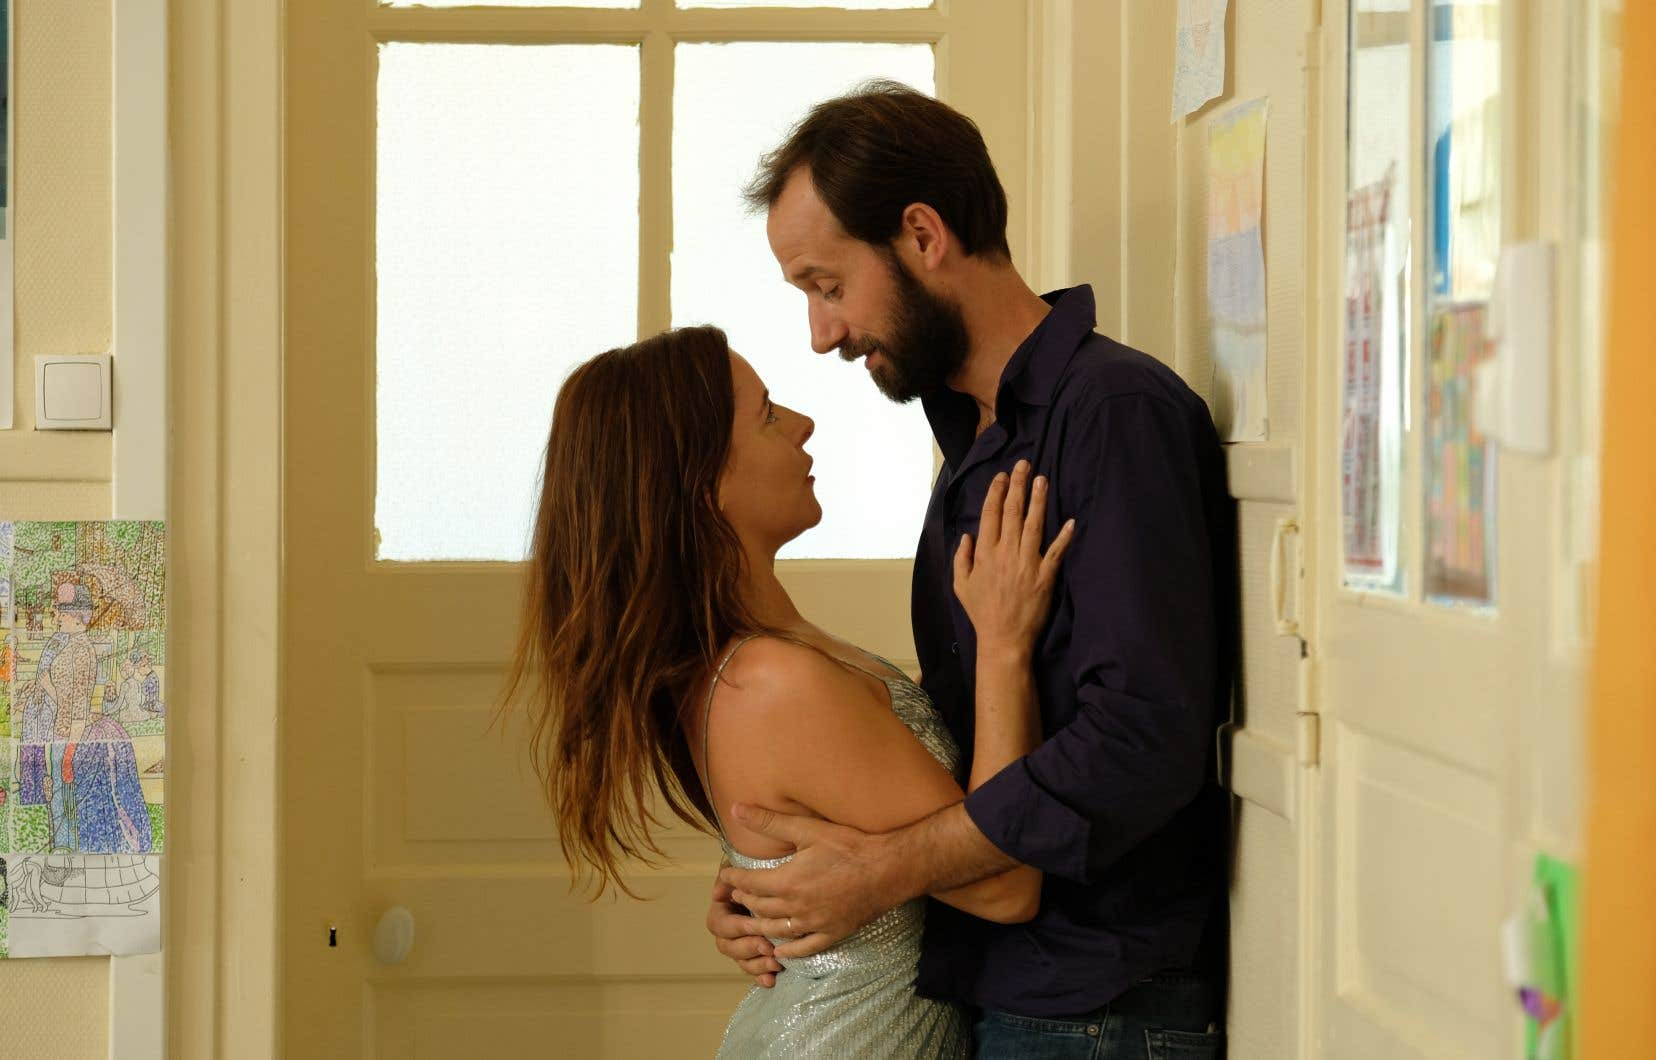 Les acteurs Laure Calamy (Antoinette) et Benjamin Lavernhe (Vladimir)